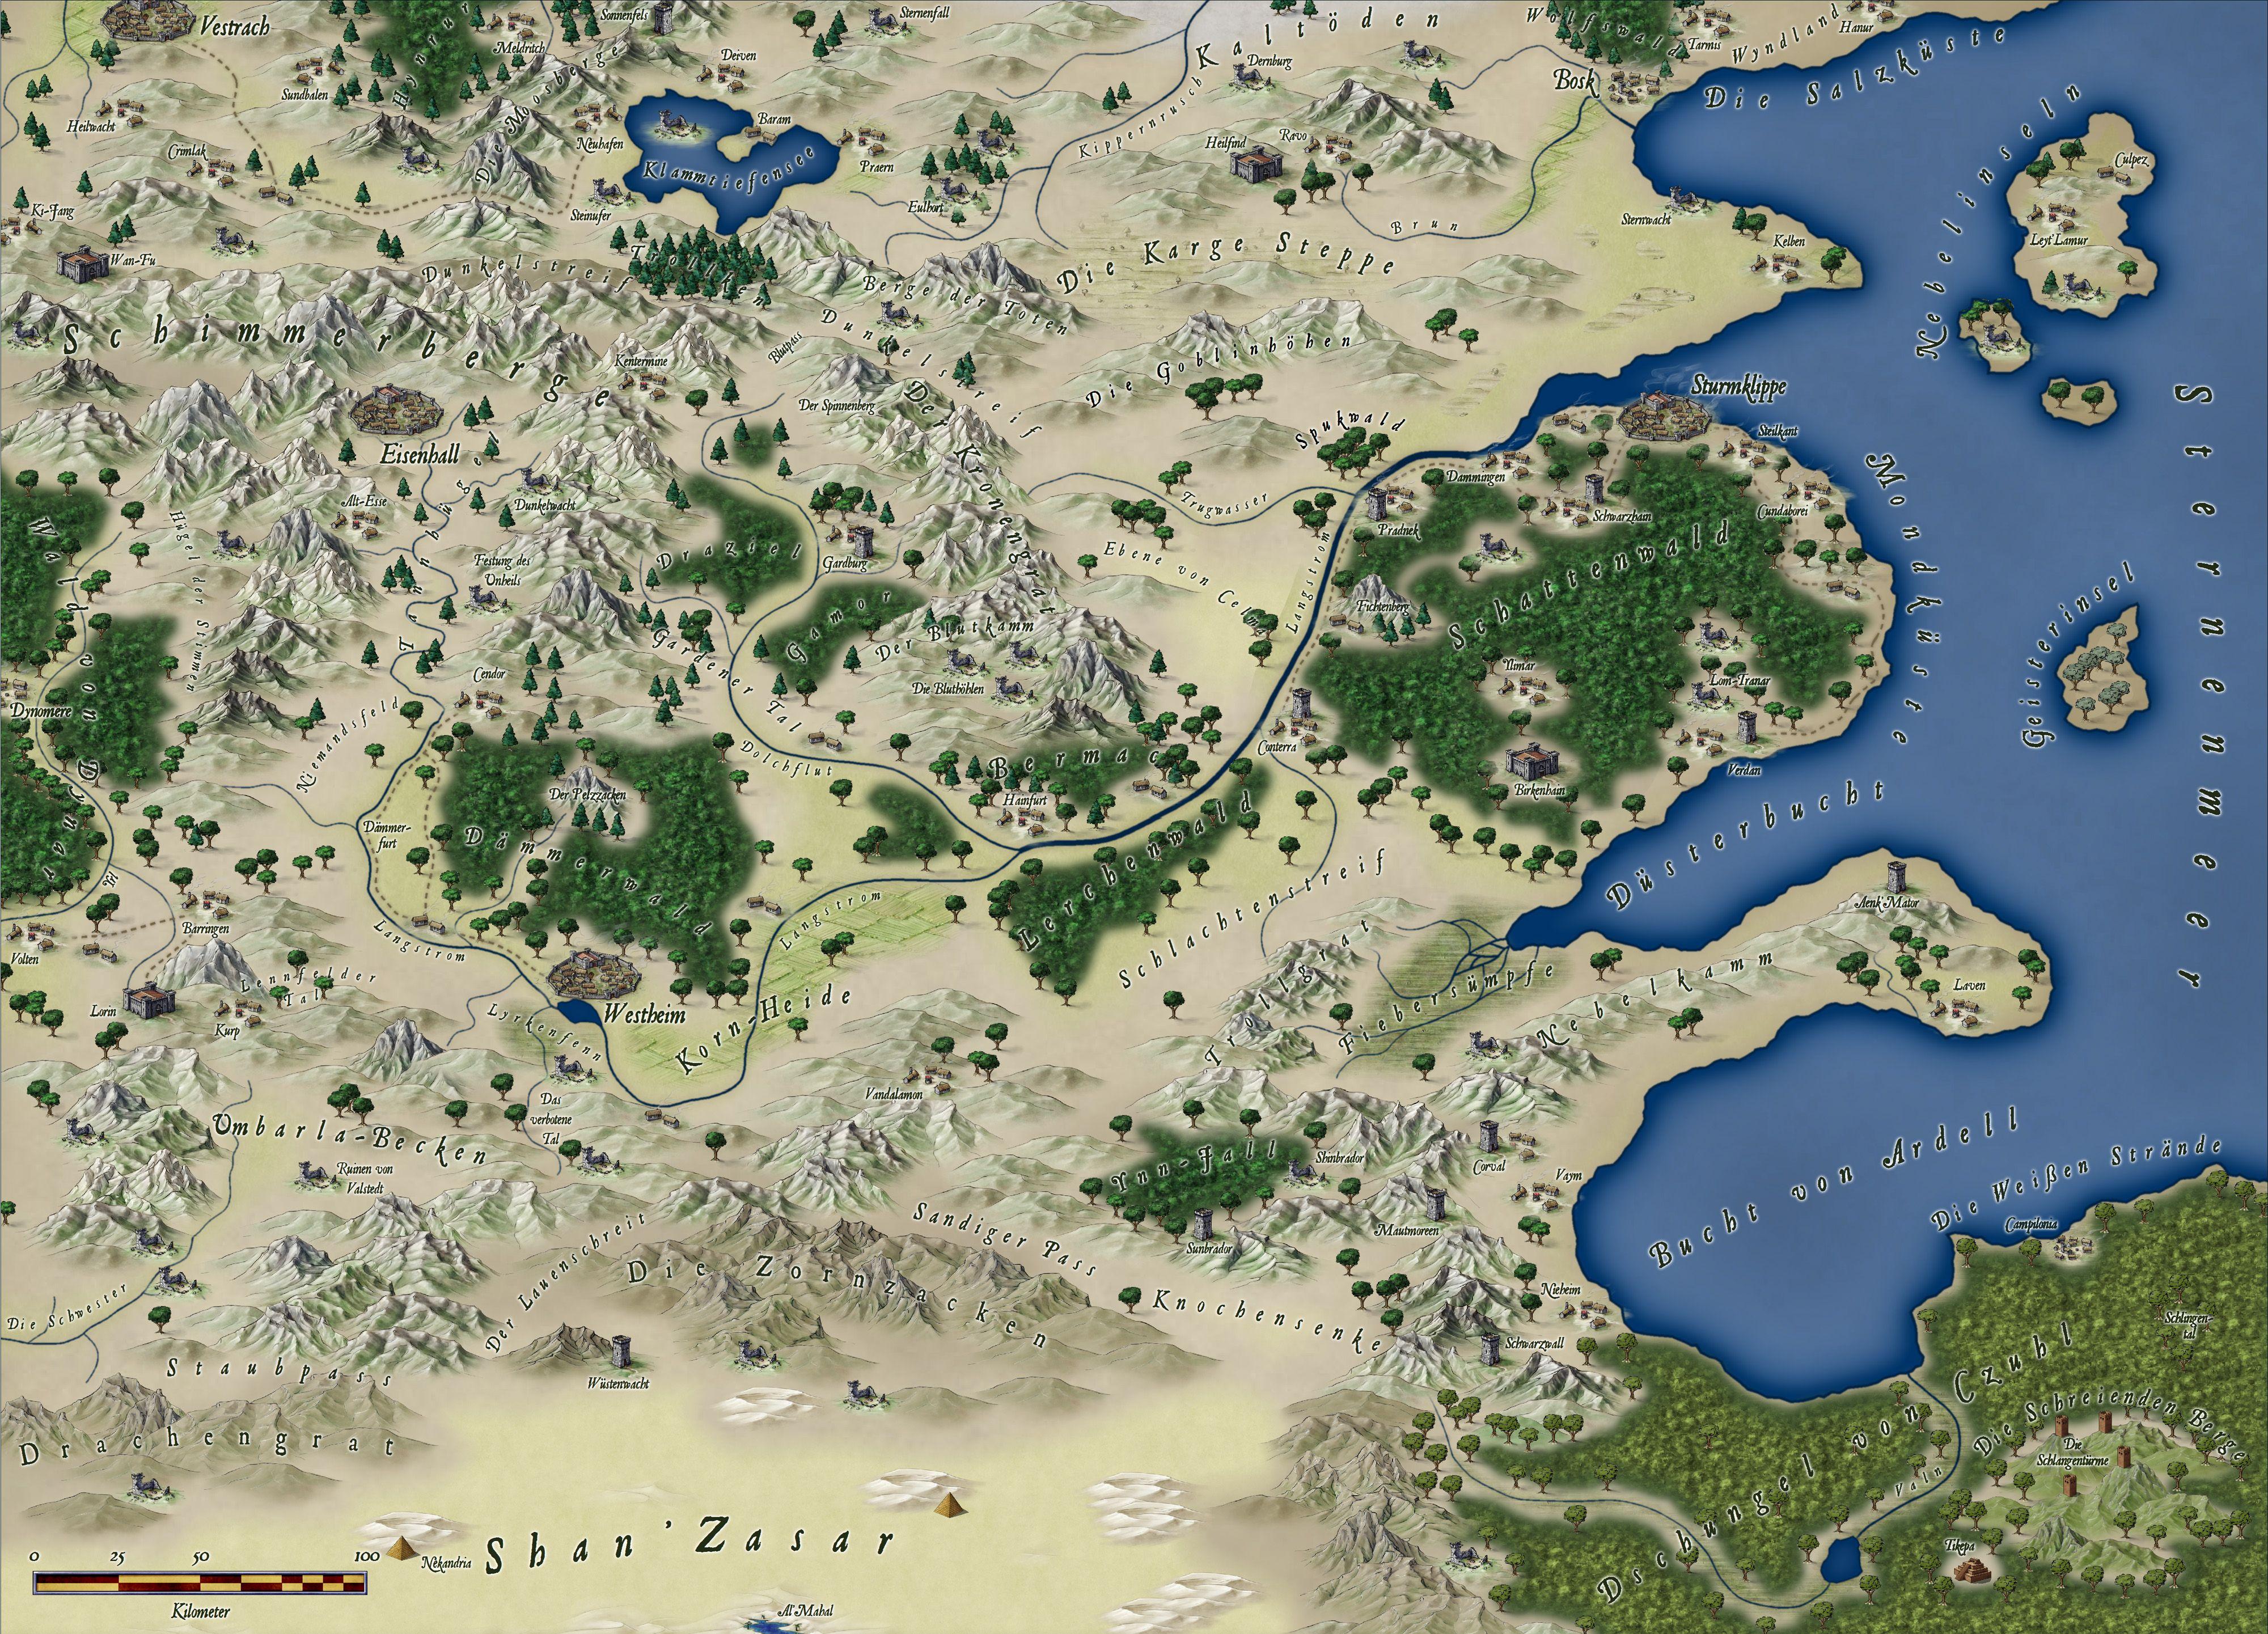 Httpmapsandmoreshopdsdsfreielandecc3grossg rpg maps the free lands of christian kennig map by ralf schemmann gumiabroncs Images